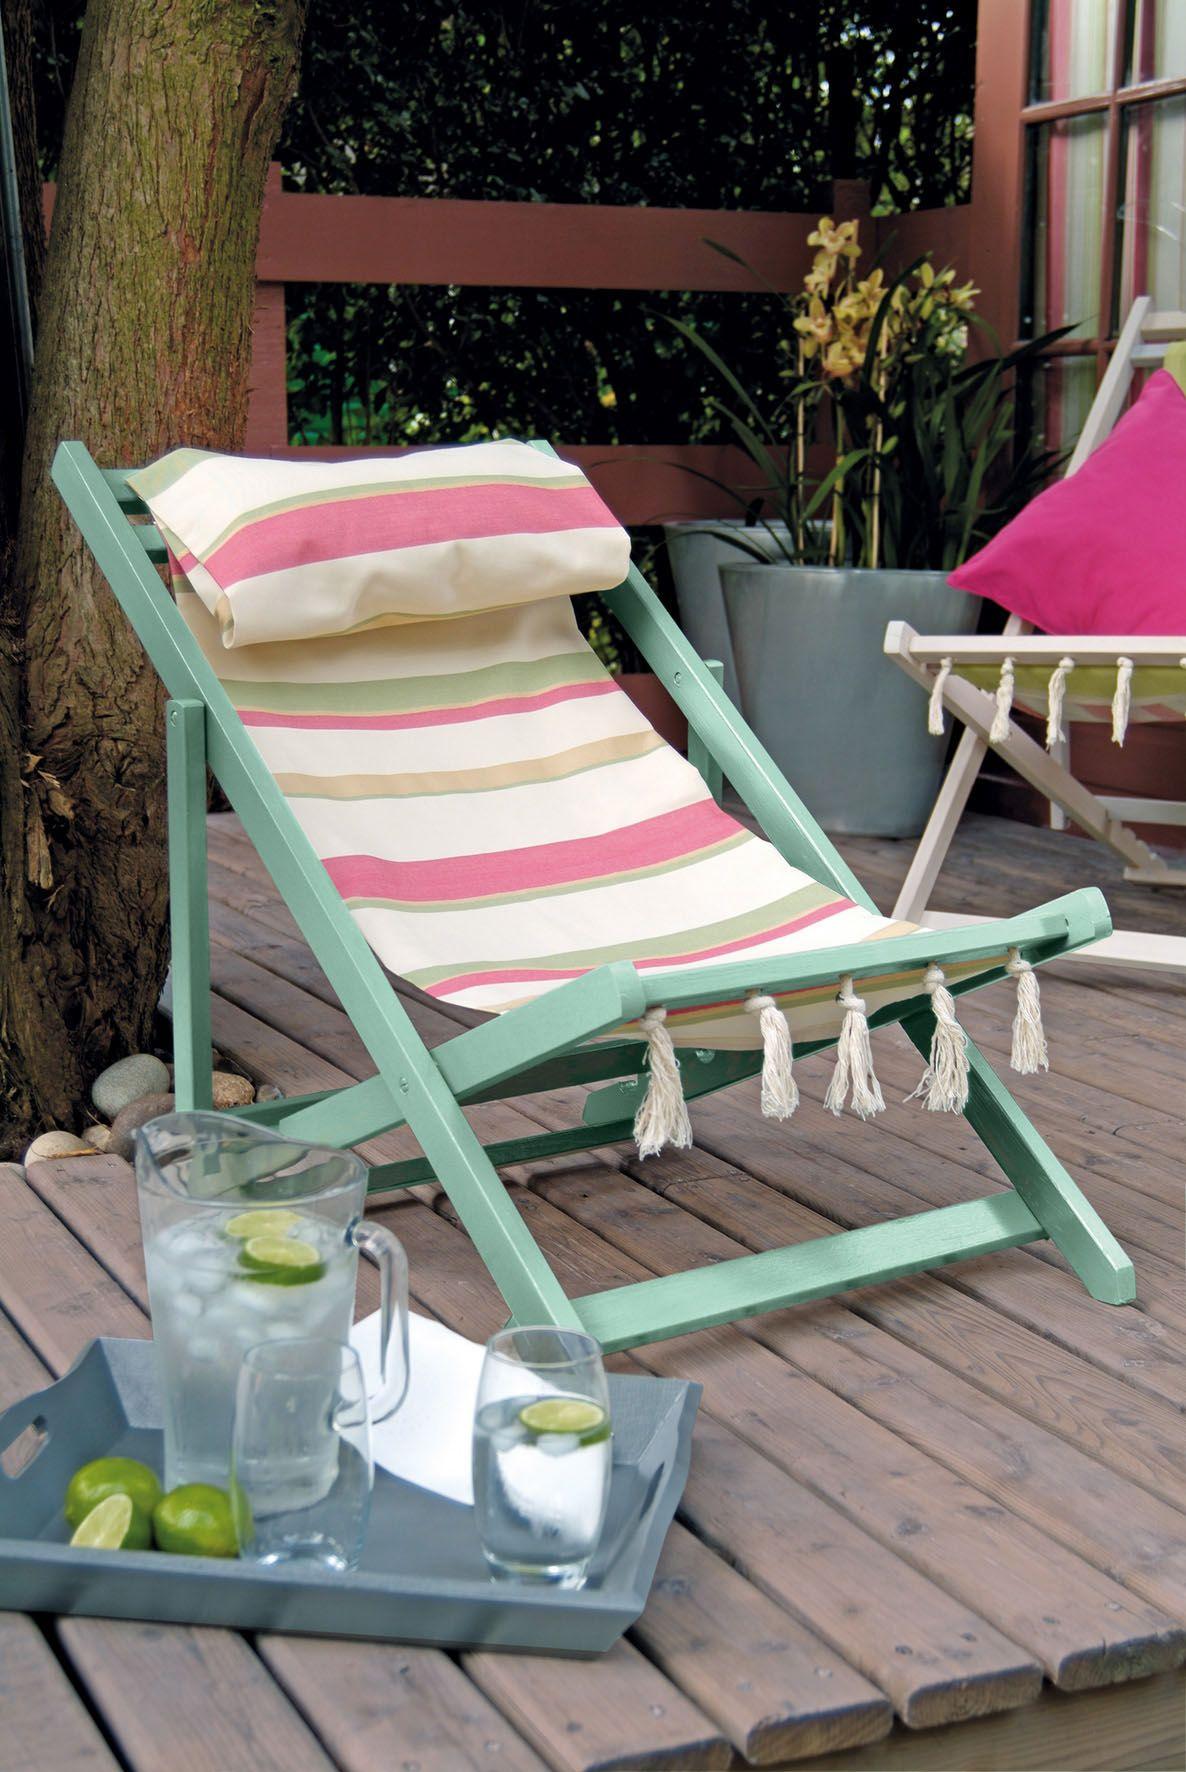 Deckchair Featuring Harry S Deck Chair From The My Garden Range